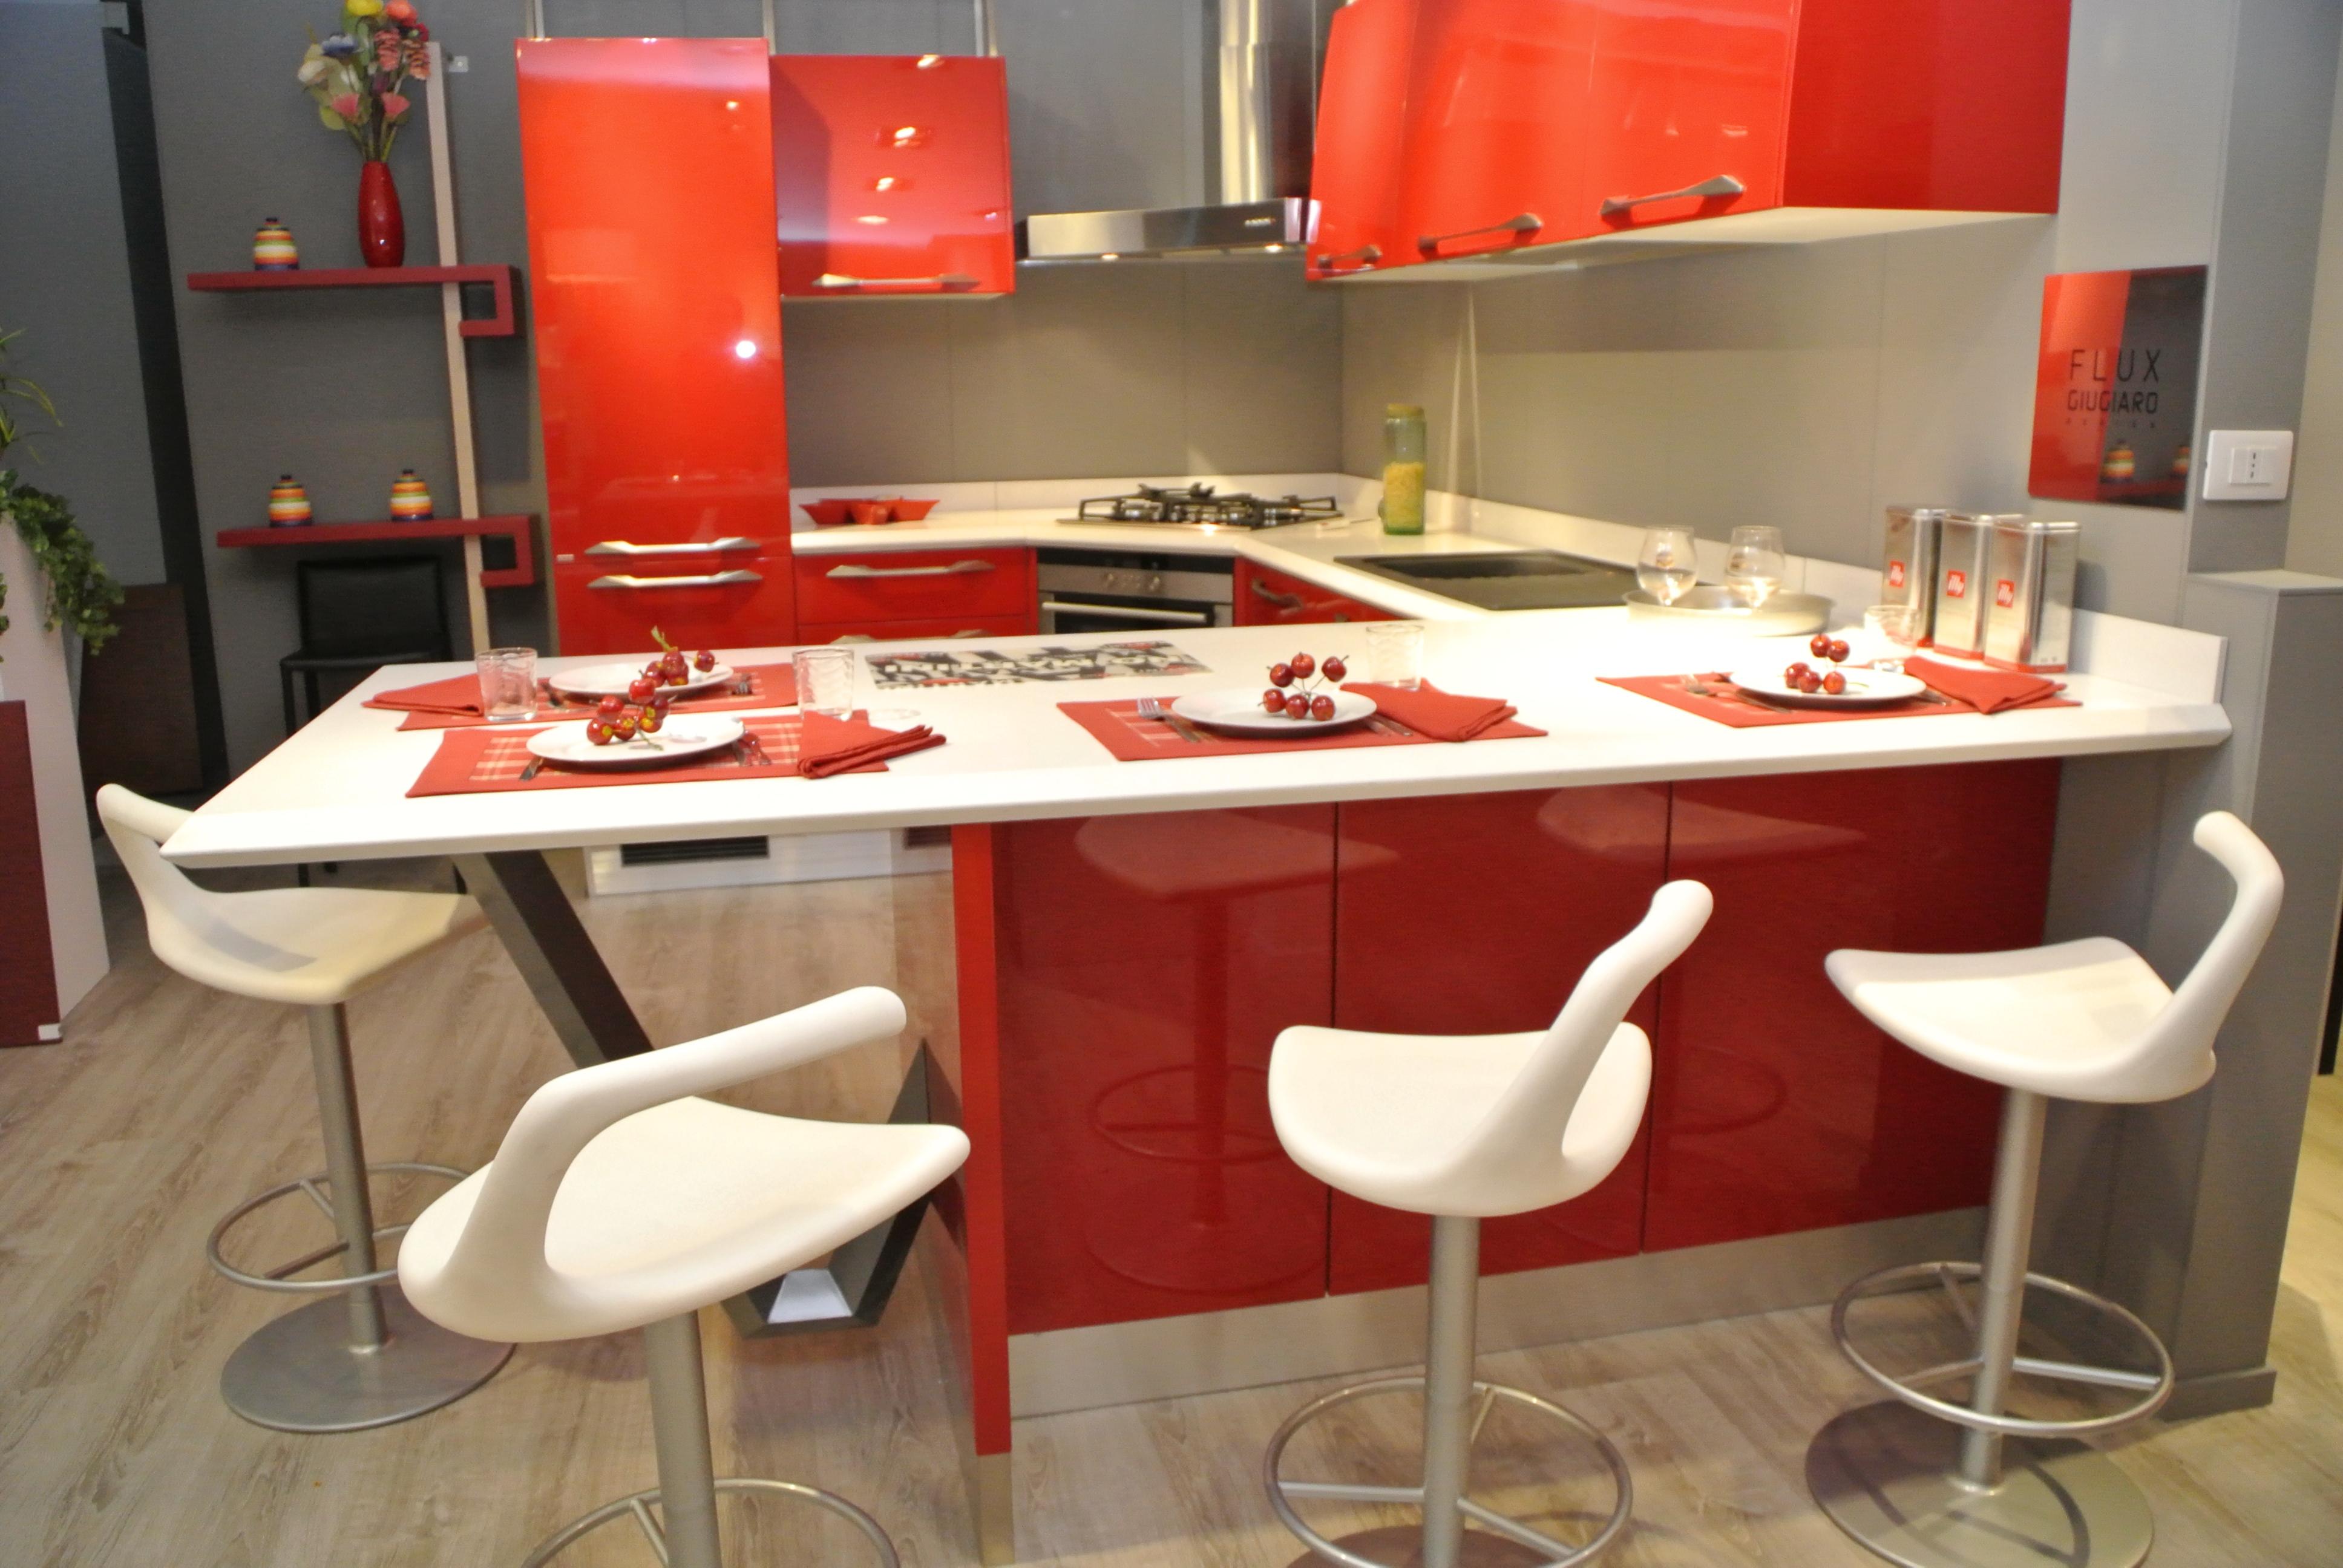 Best Cucina Flux Scavolini Prezzo Ideas - Home Ideas - tyger.us